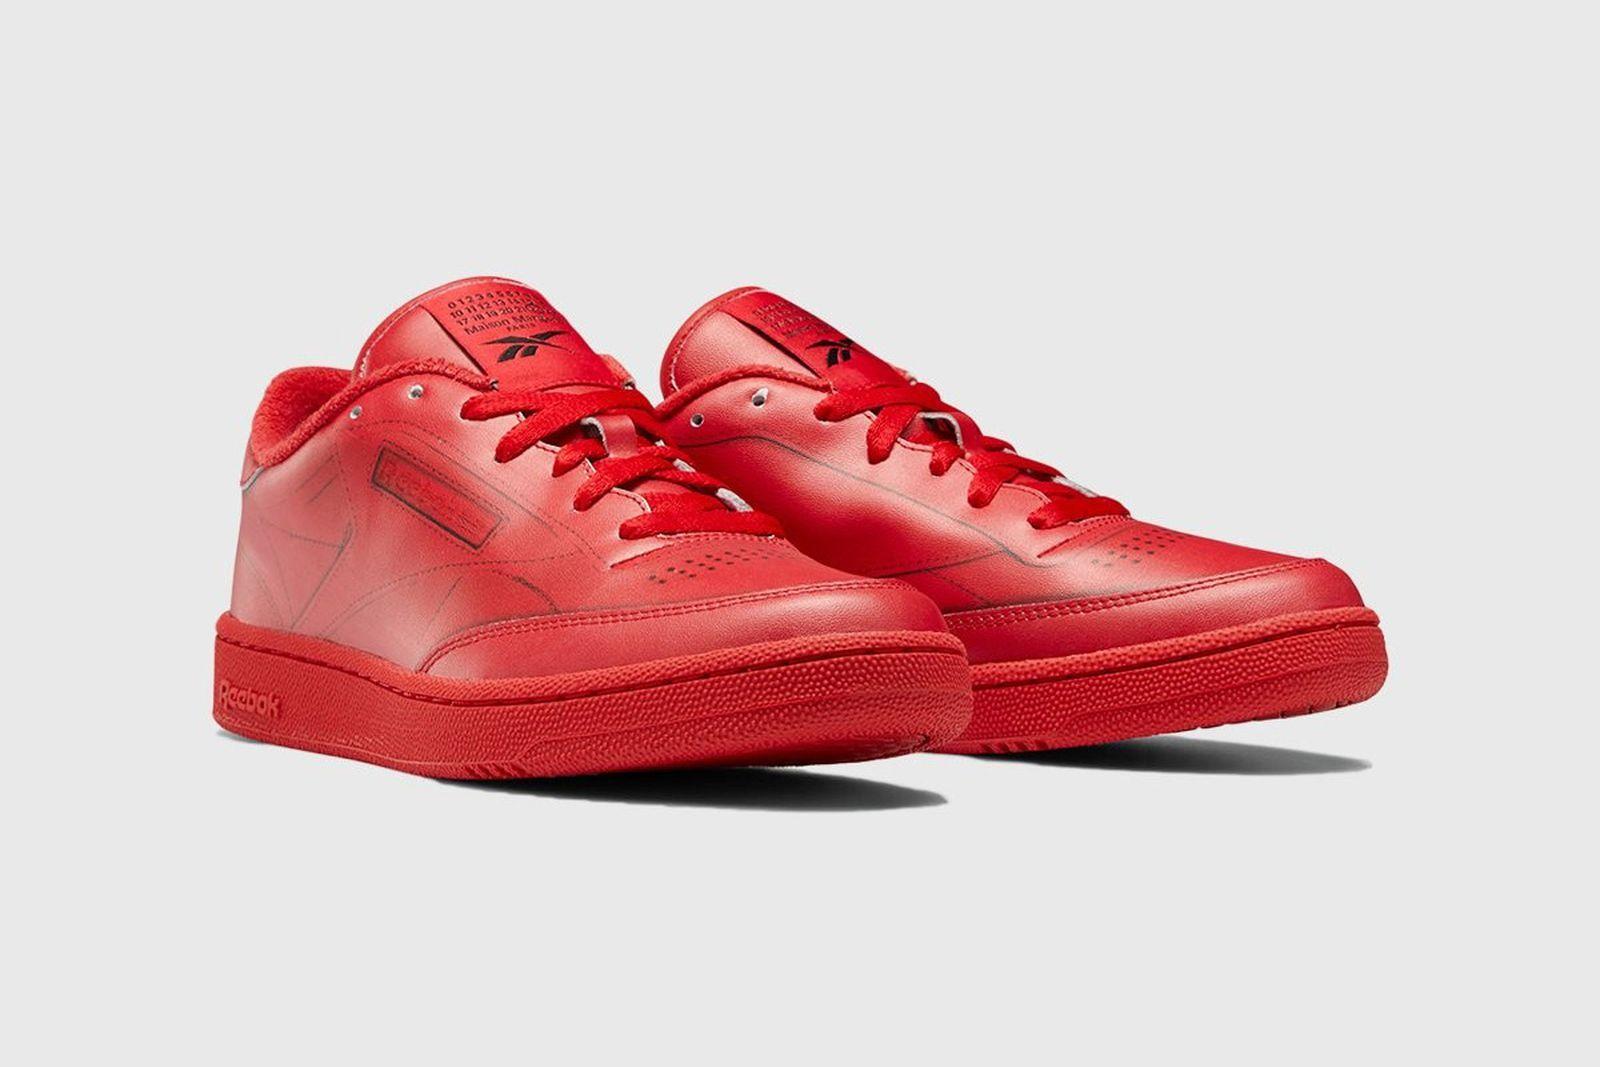 maison-margiela-reebok-classic-leather-tabi-red-grey-release-date-price-010